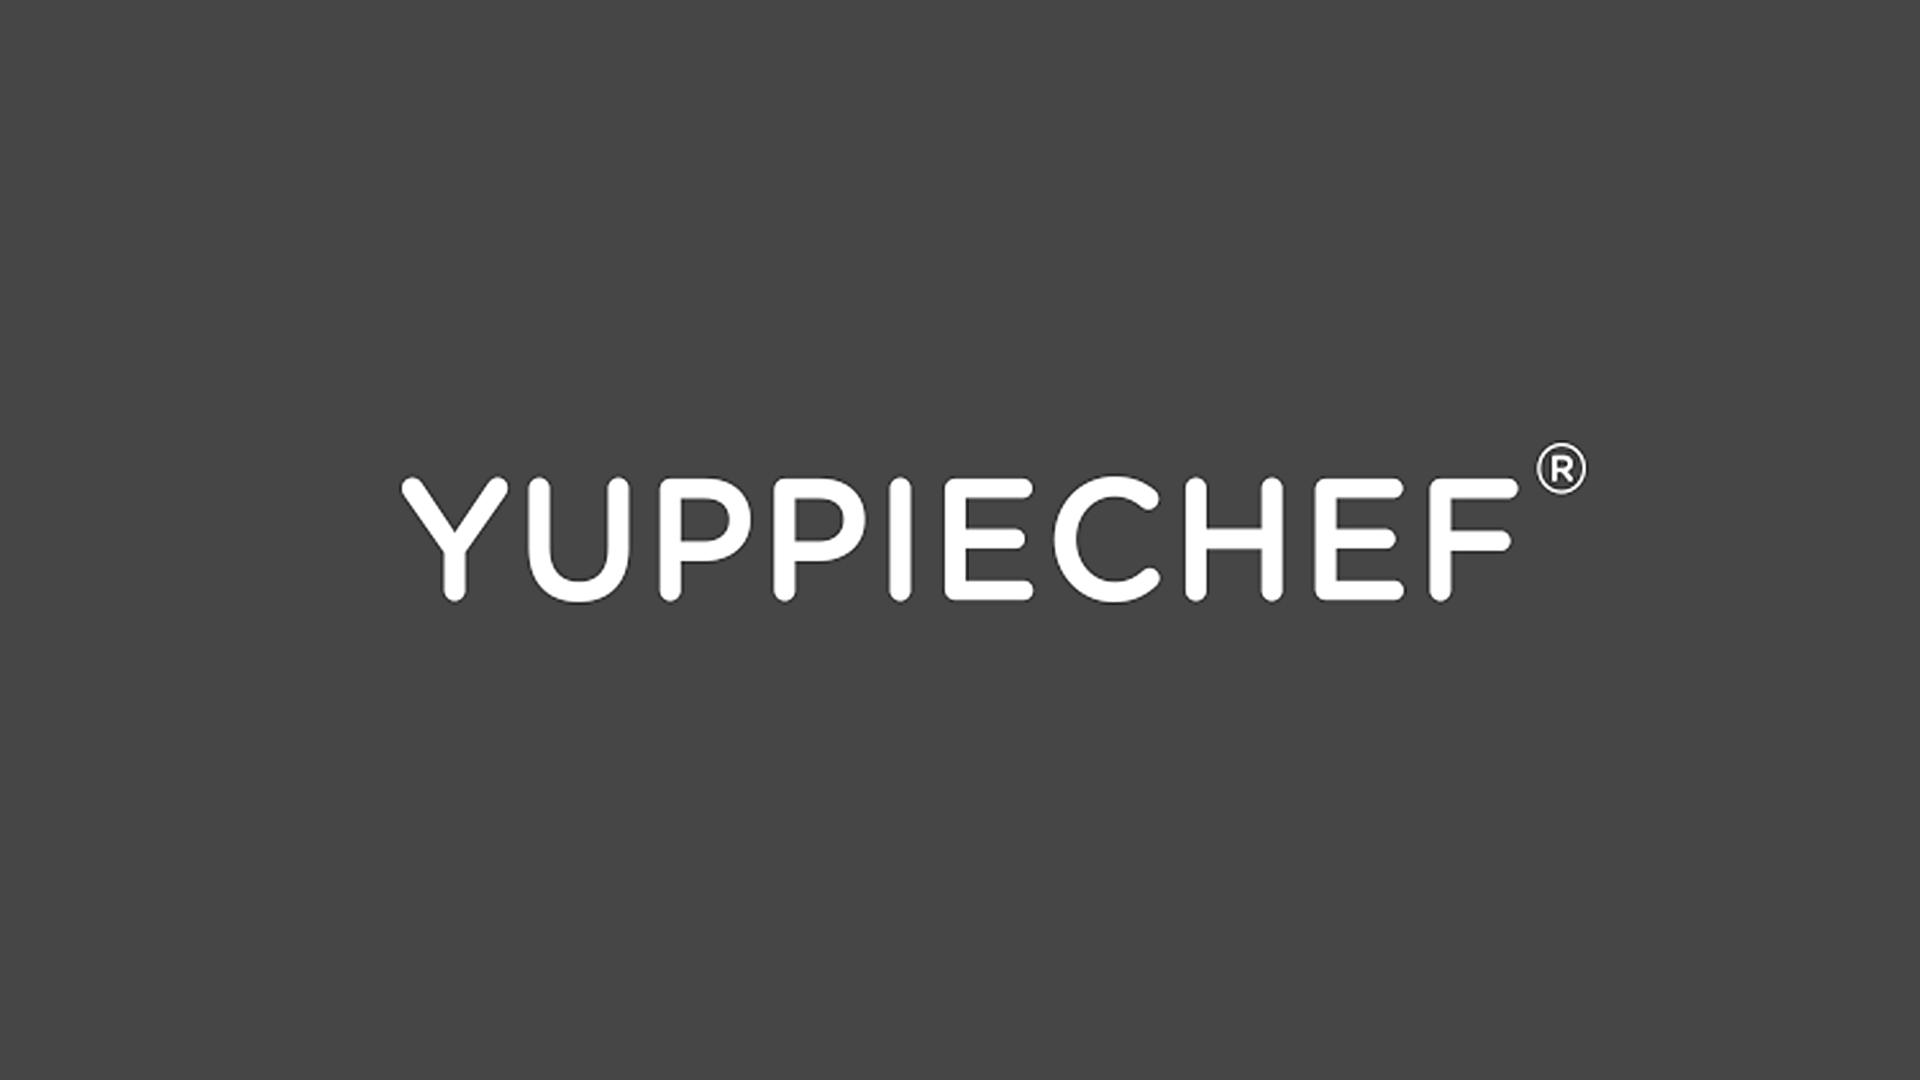 1920x1080_yuppiechef